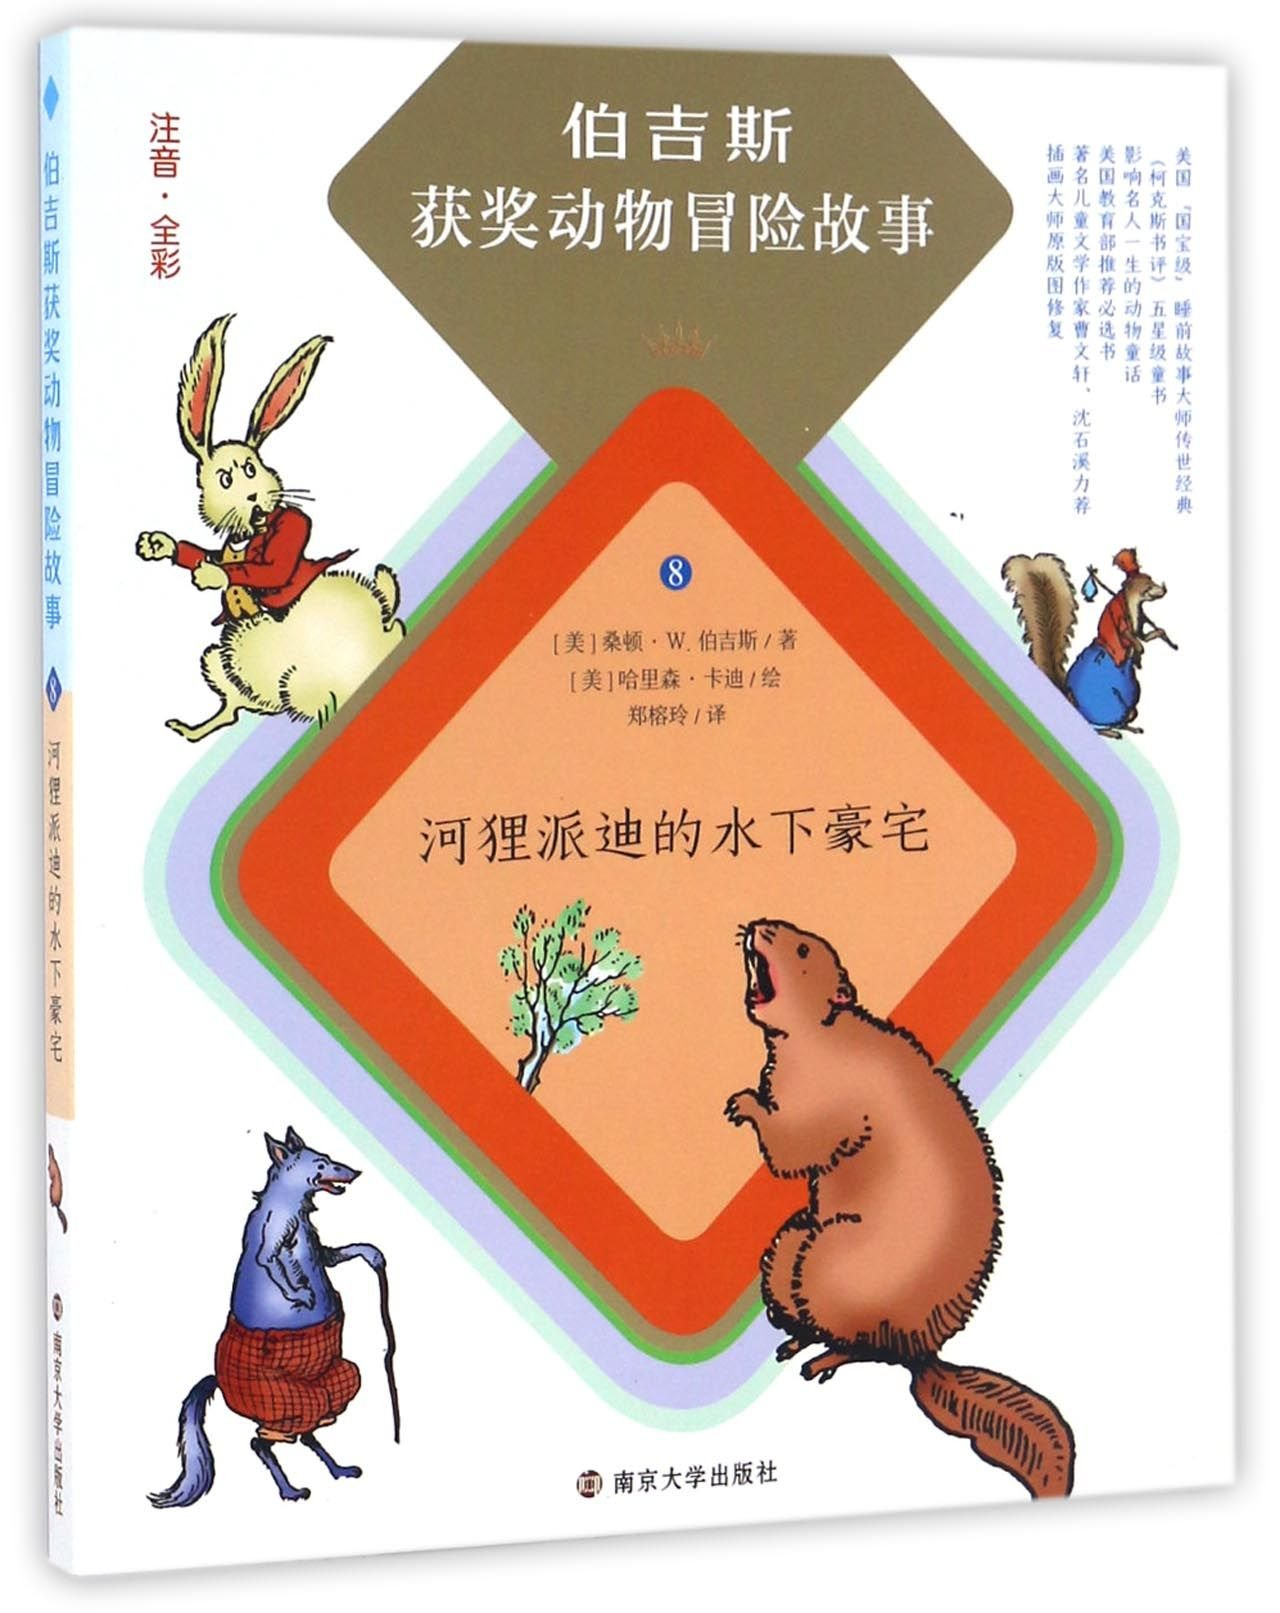 ePub fb2 ebook